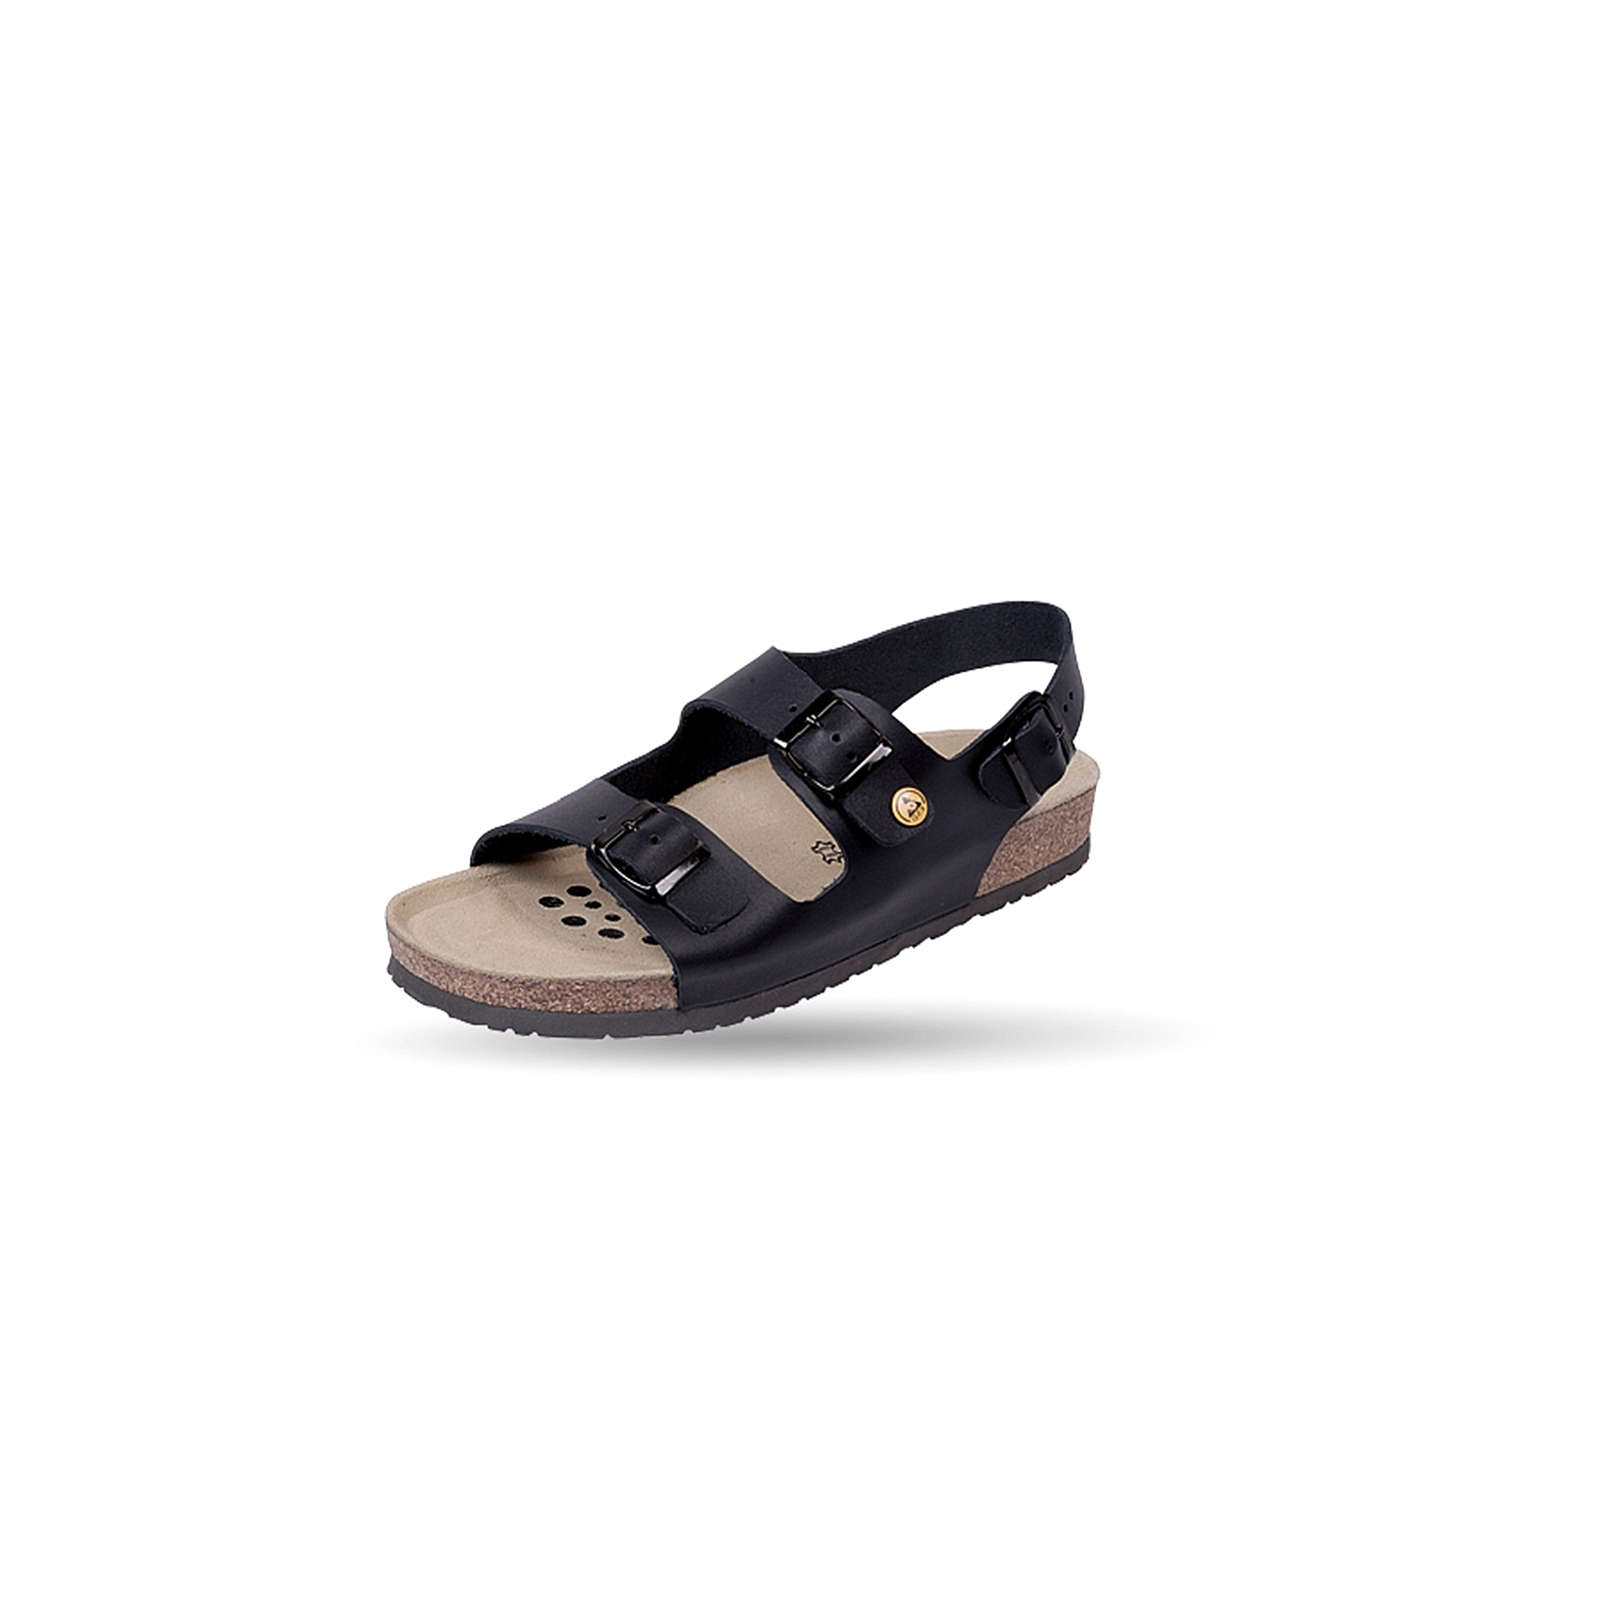 Weeger ESD-Sandal antist. Art. 45115-20 Arbeitssandalen schwarz Gr. 41